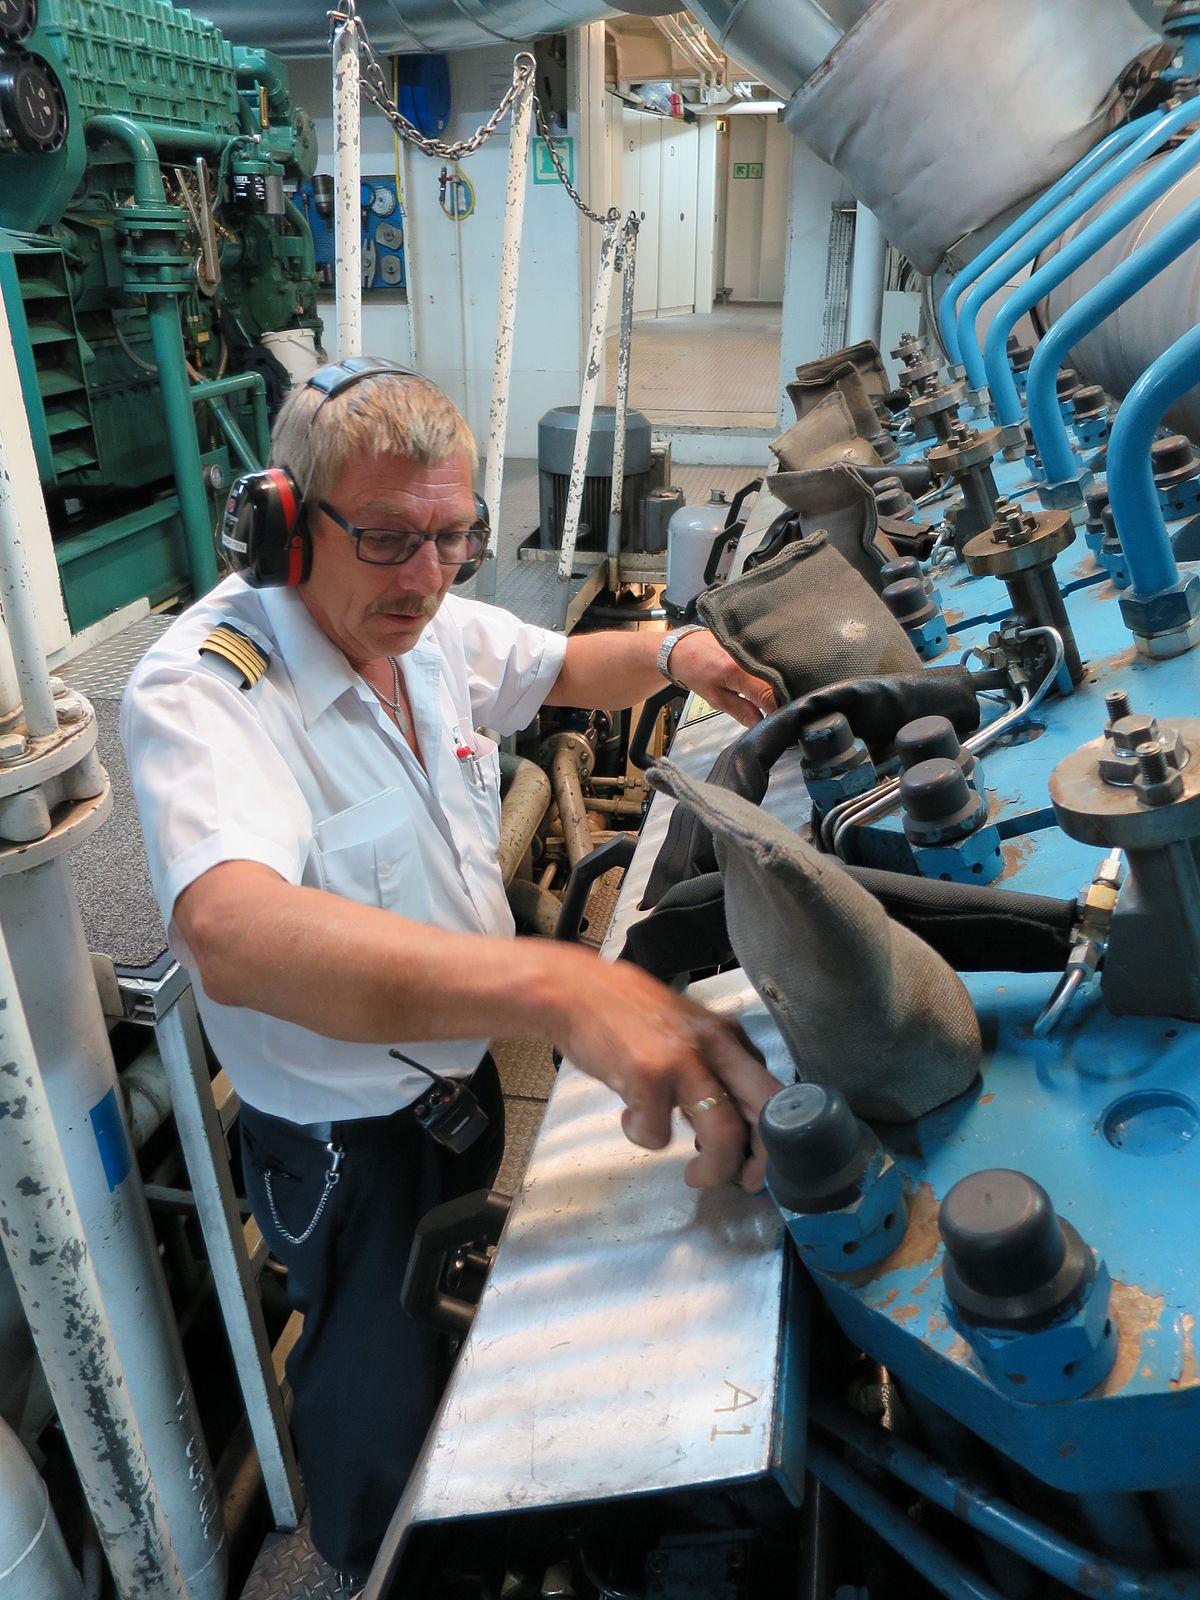 Boat Engine Room: Chief Engineer